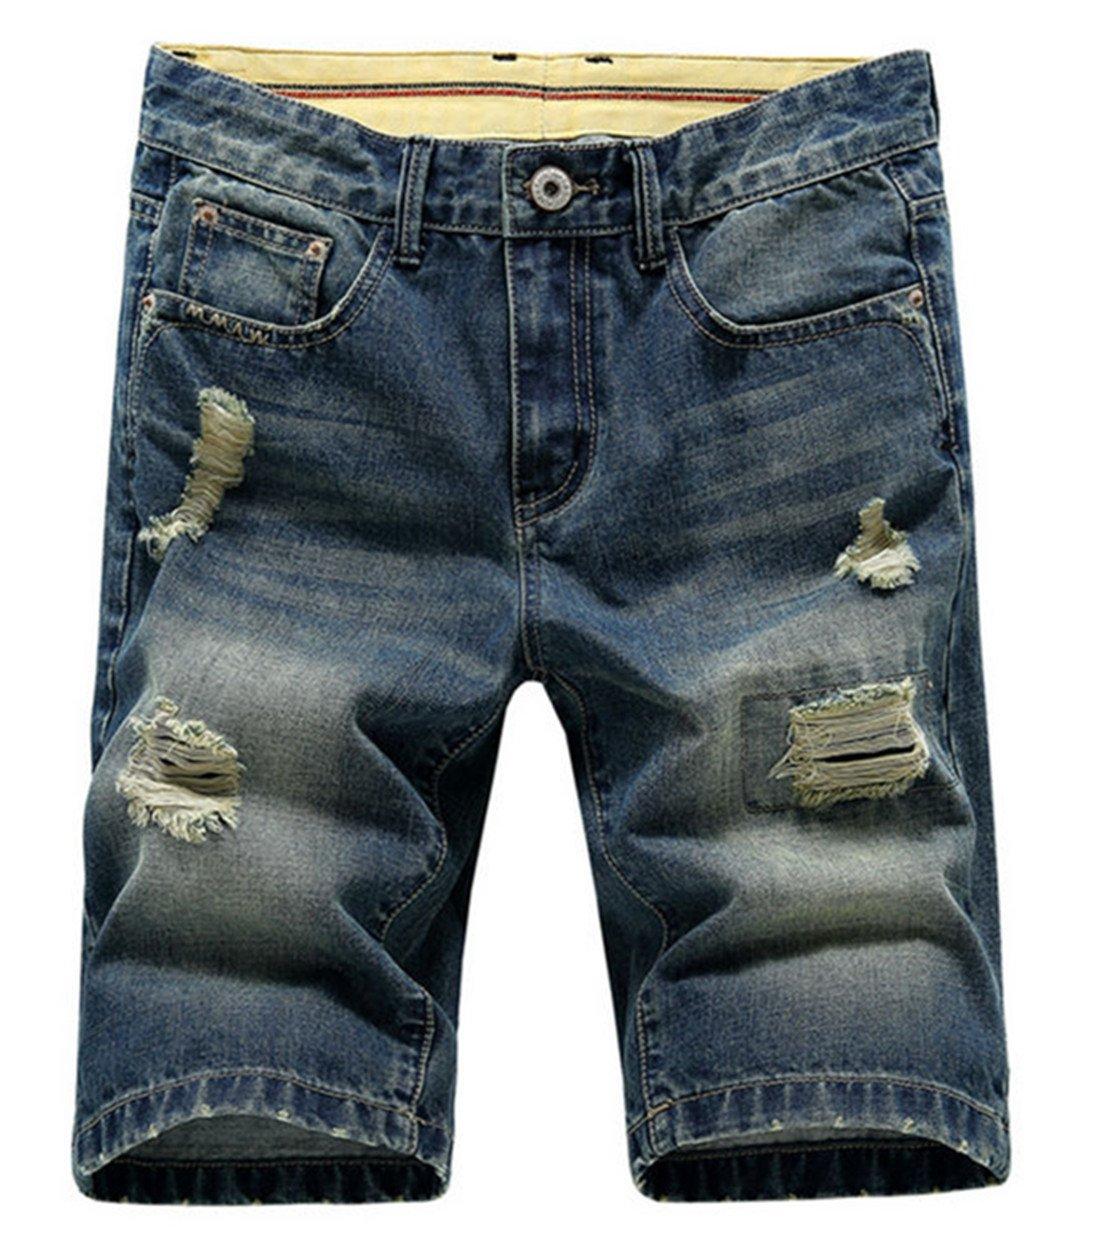 Hzcx Fashion Men's Summer Light Weight Blue Short Jeans Slim Brush Denim Shorts